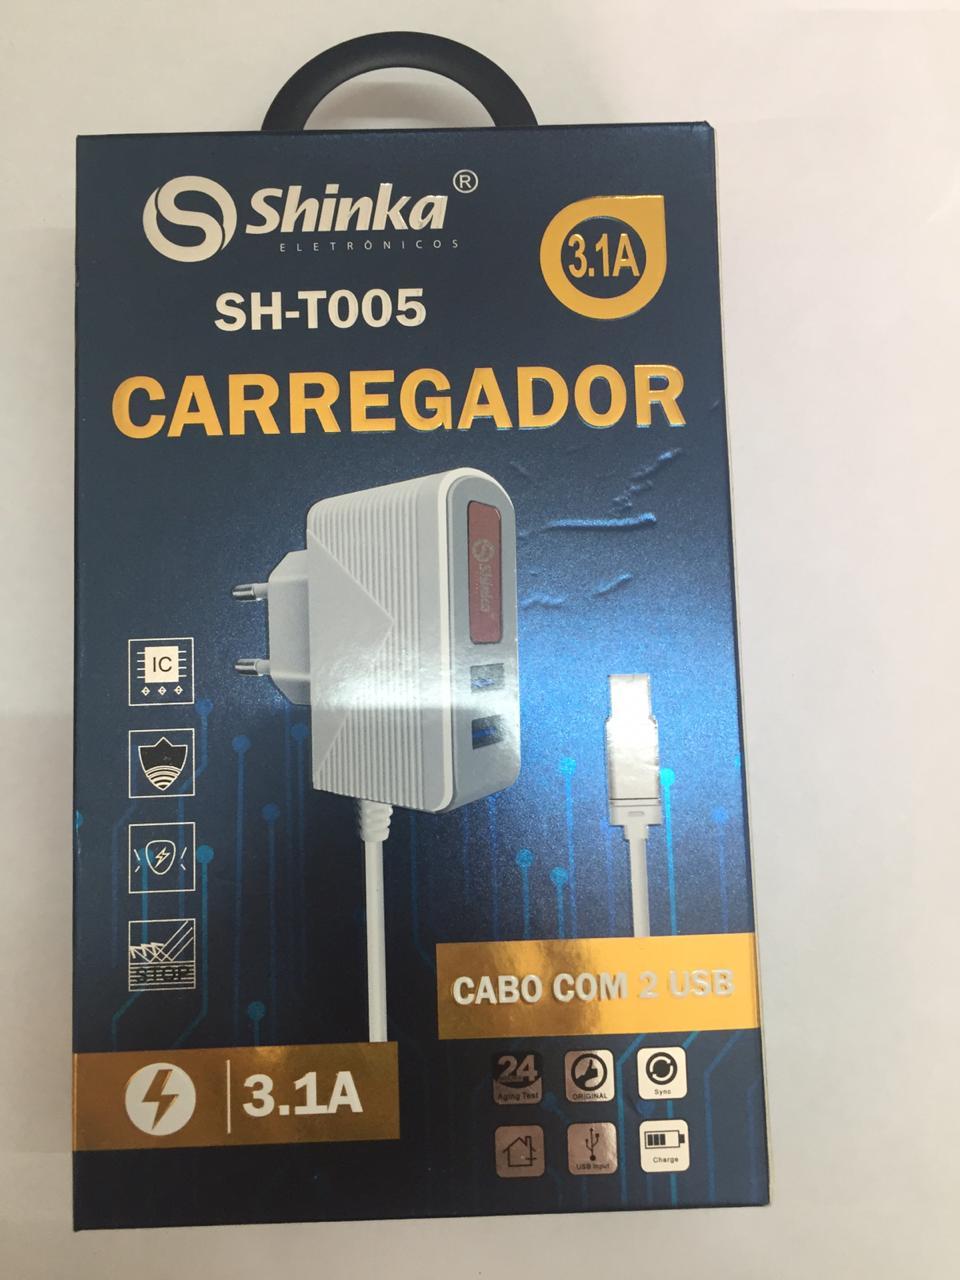 CARREGADOR TOMADA 2 USB 5V- 3.1A - CHIPS INTELIGENTE - PROTEÇAO DE CARGA TOTAL - SHINKA SH-T005-IF